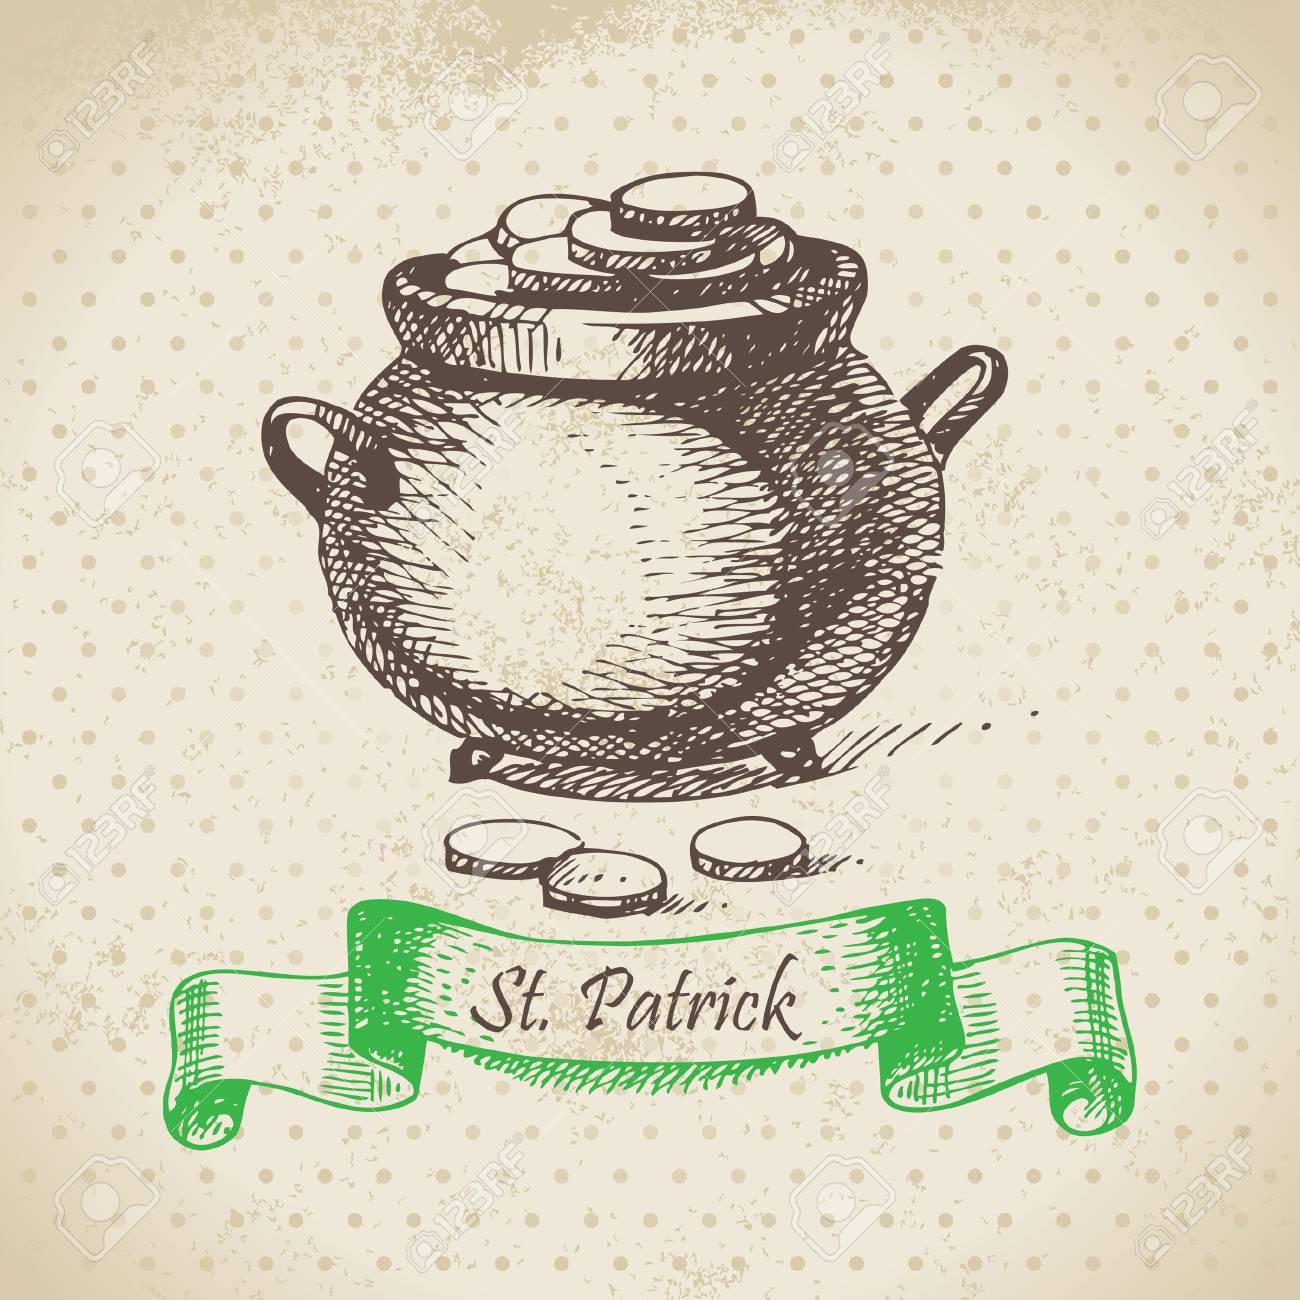 St. Patrick's Day vintage background. Hand drawn illustration Stock Vector - 18002424